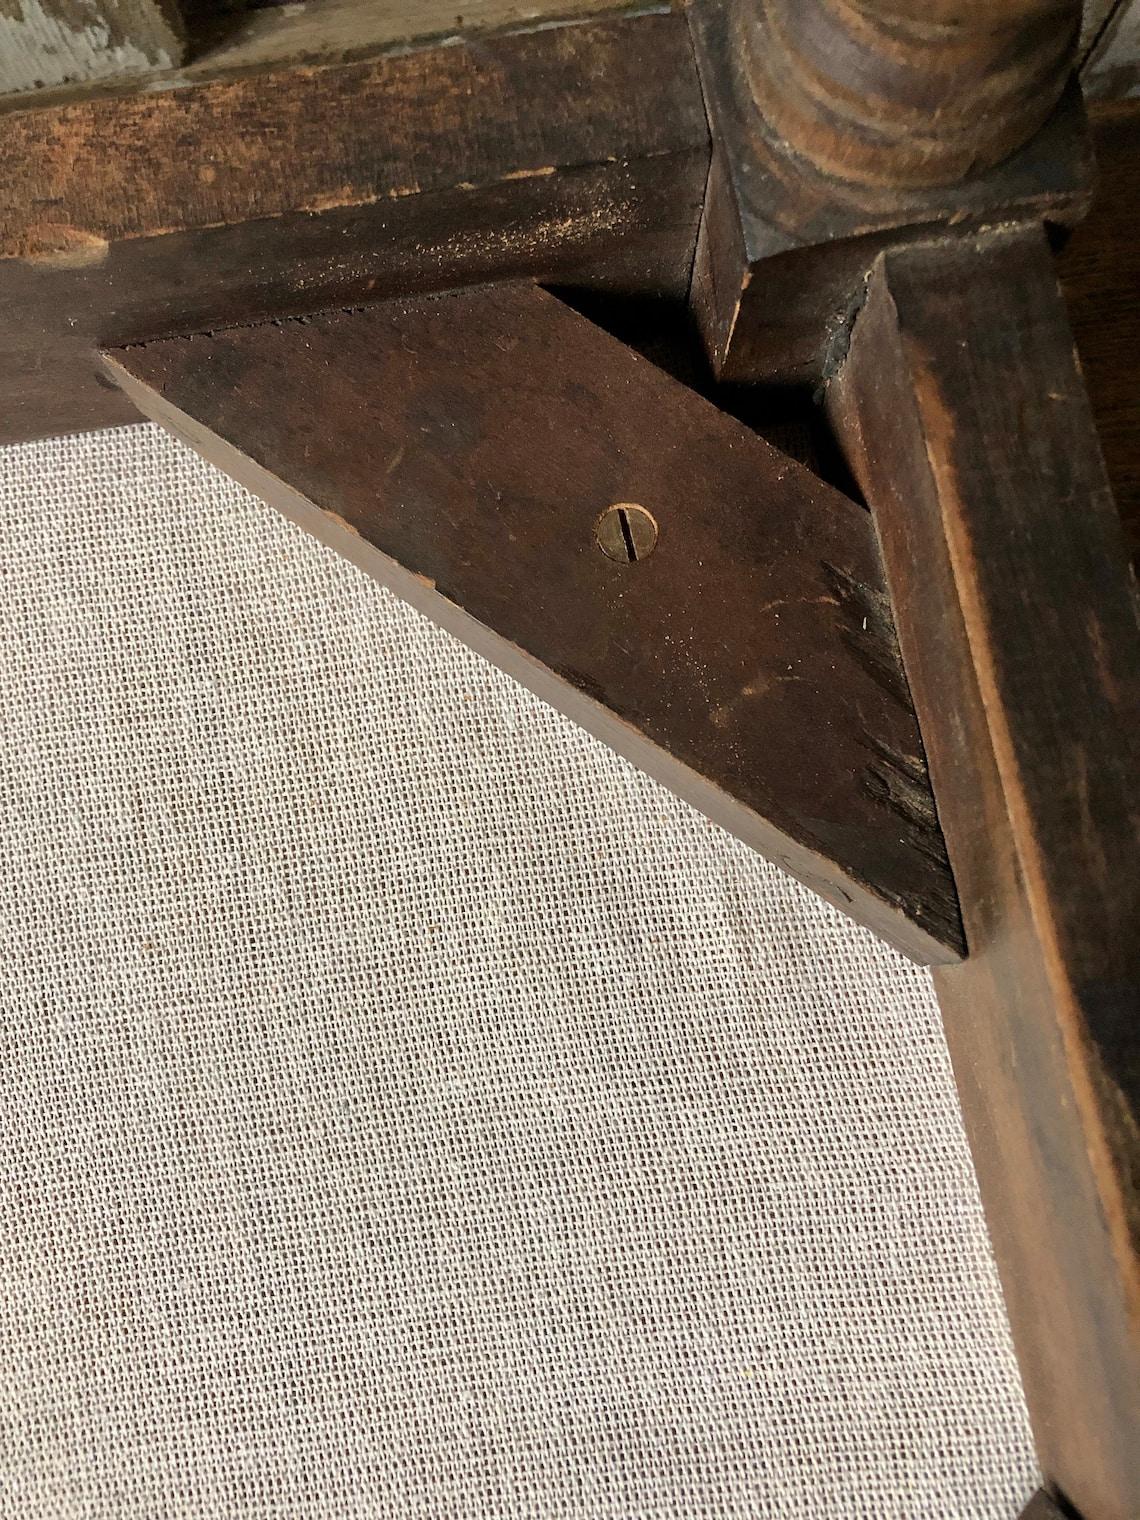 Vintage Footstool Ottoman Covered in European Grain Sack